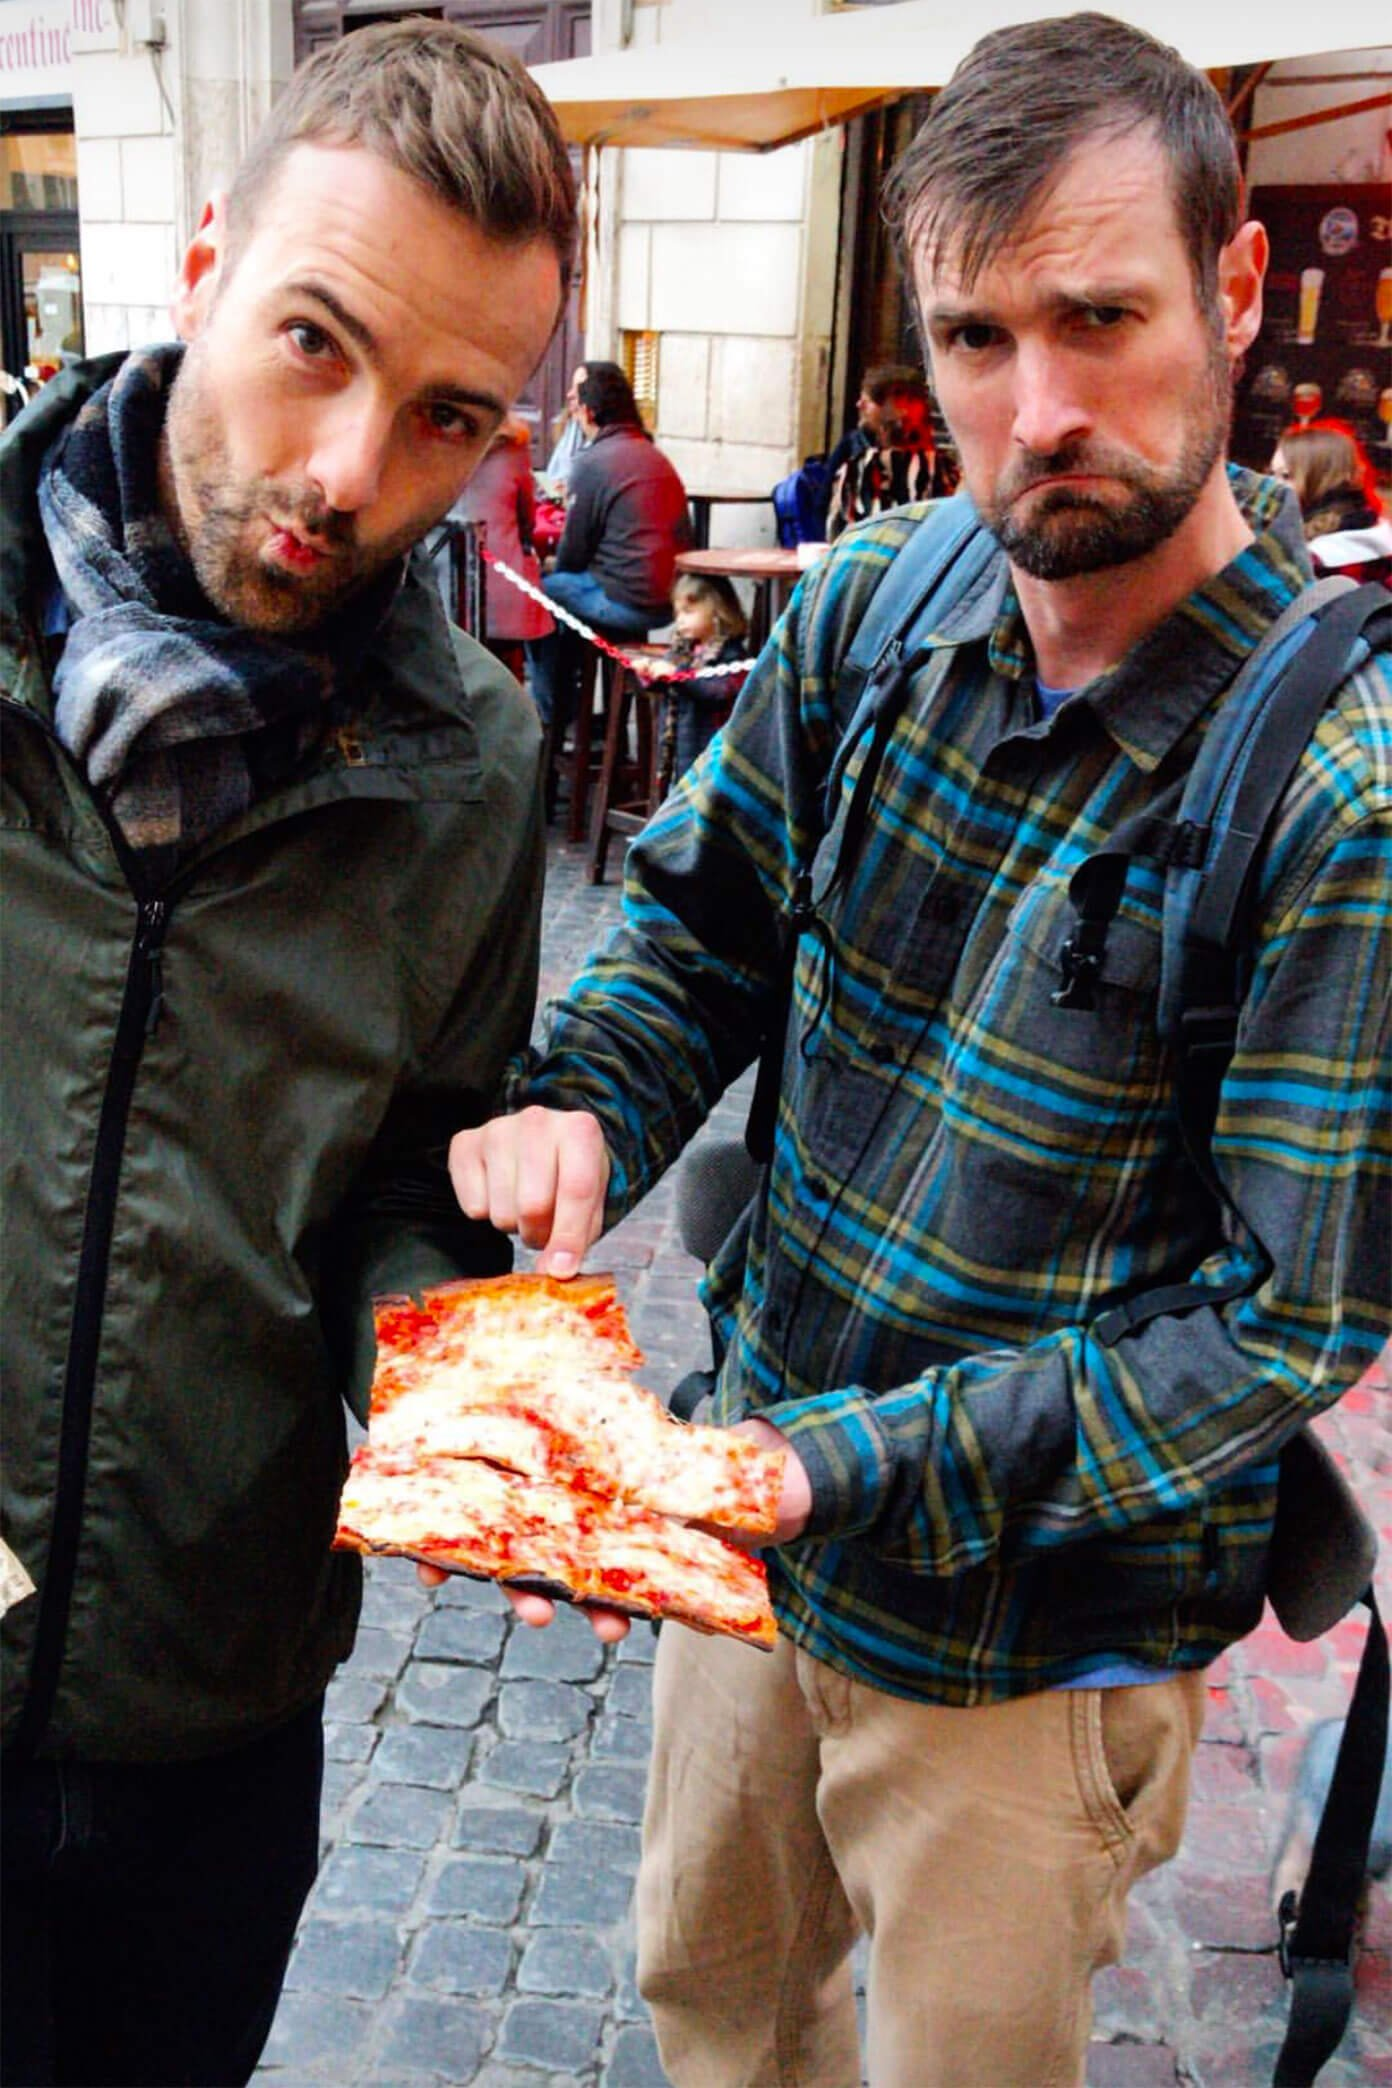 Eating Italy Taste of Testaccio Food Tour in Rome